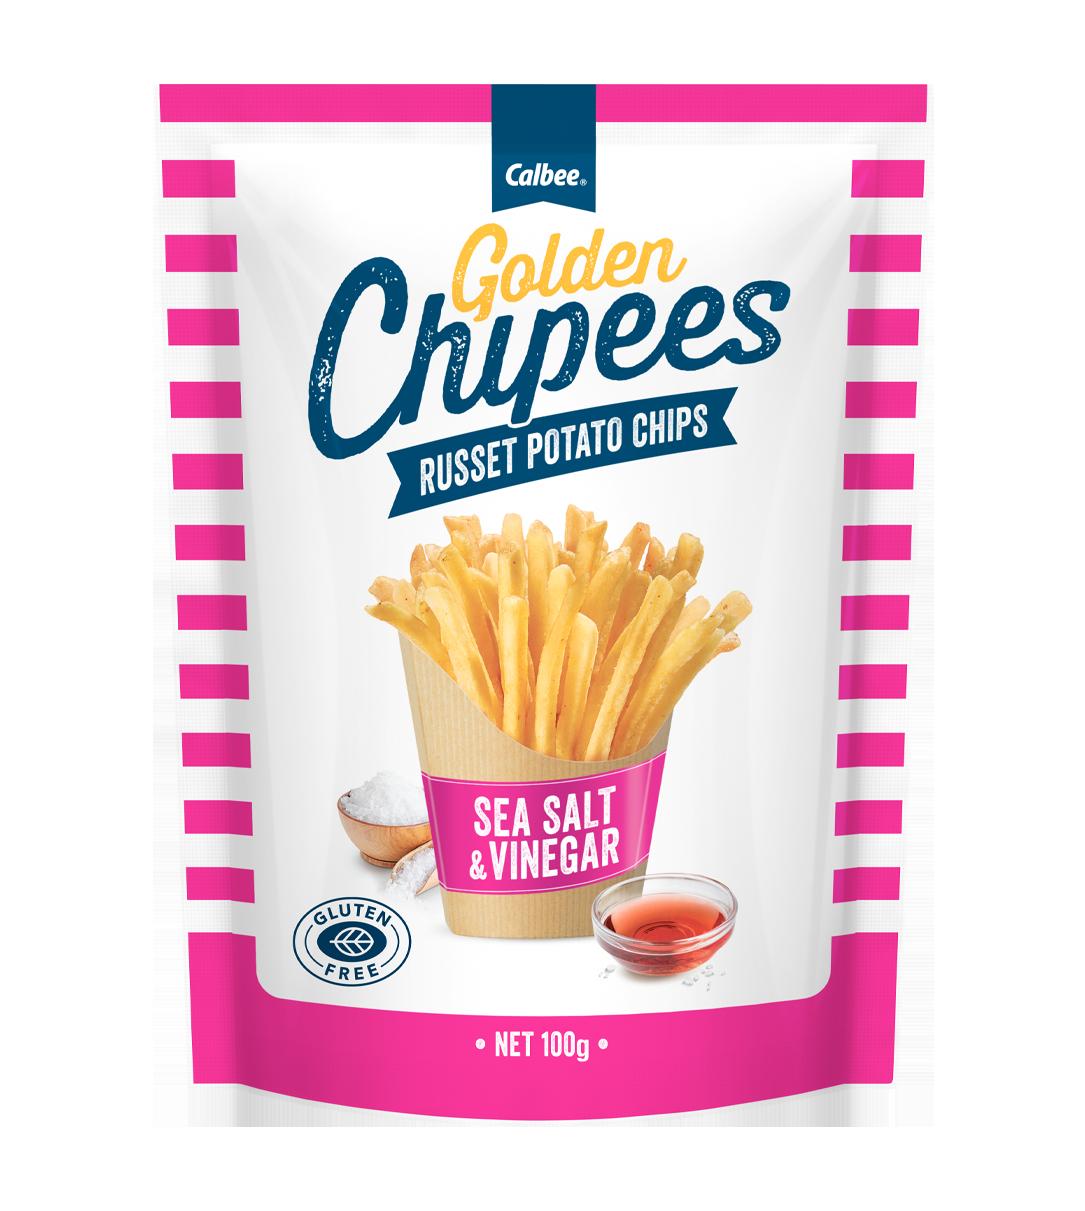 Calbee Australia - Golden Chipees - Russet Potato Chips - Sea Salt & Vinegar